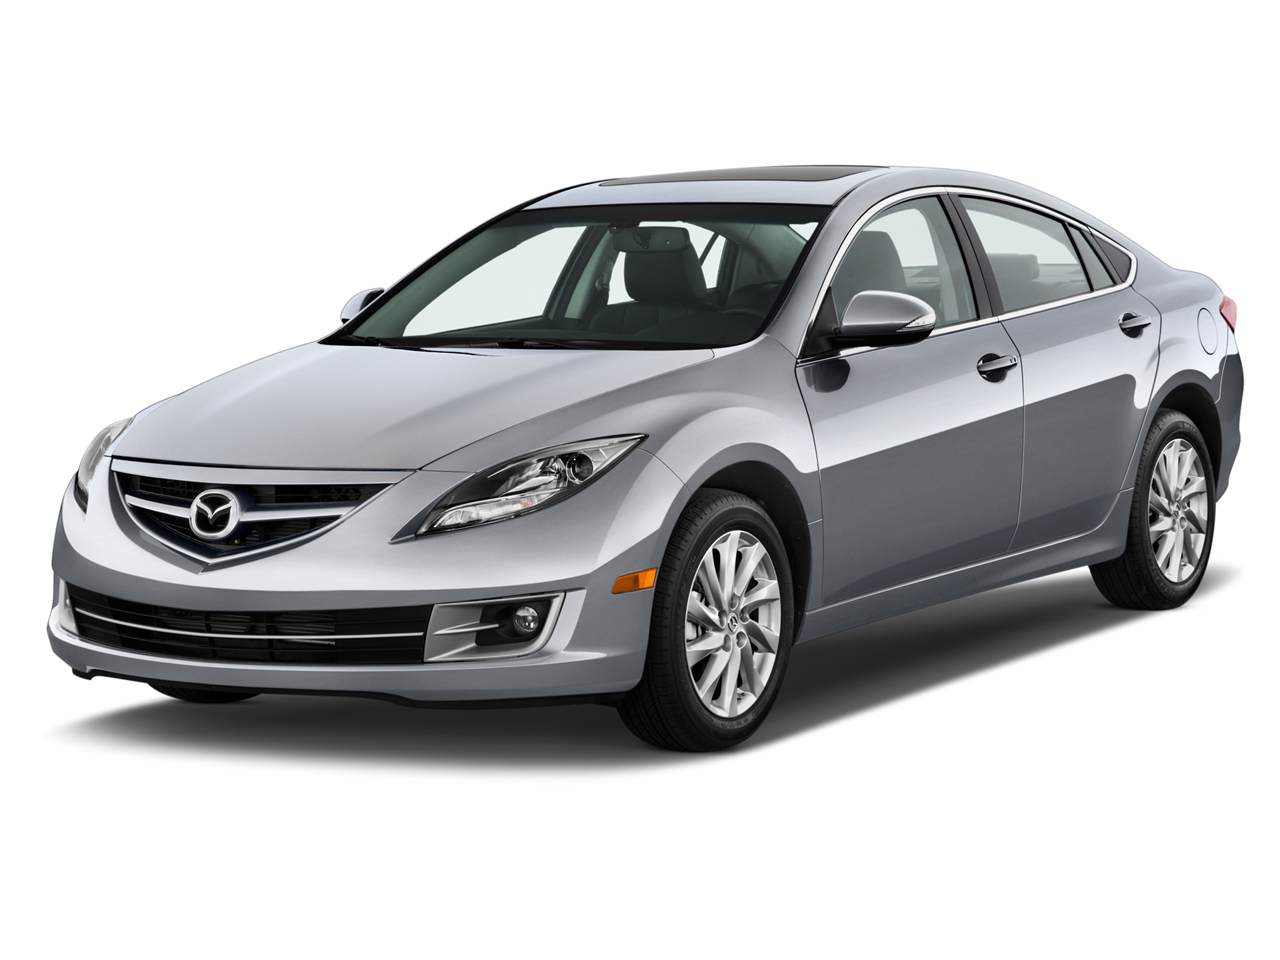 Kelebihan Mazda 6 2012 Spesifikasi